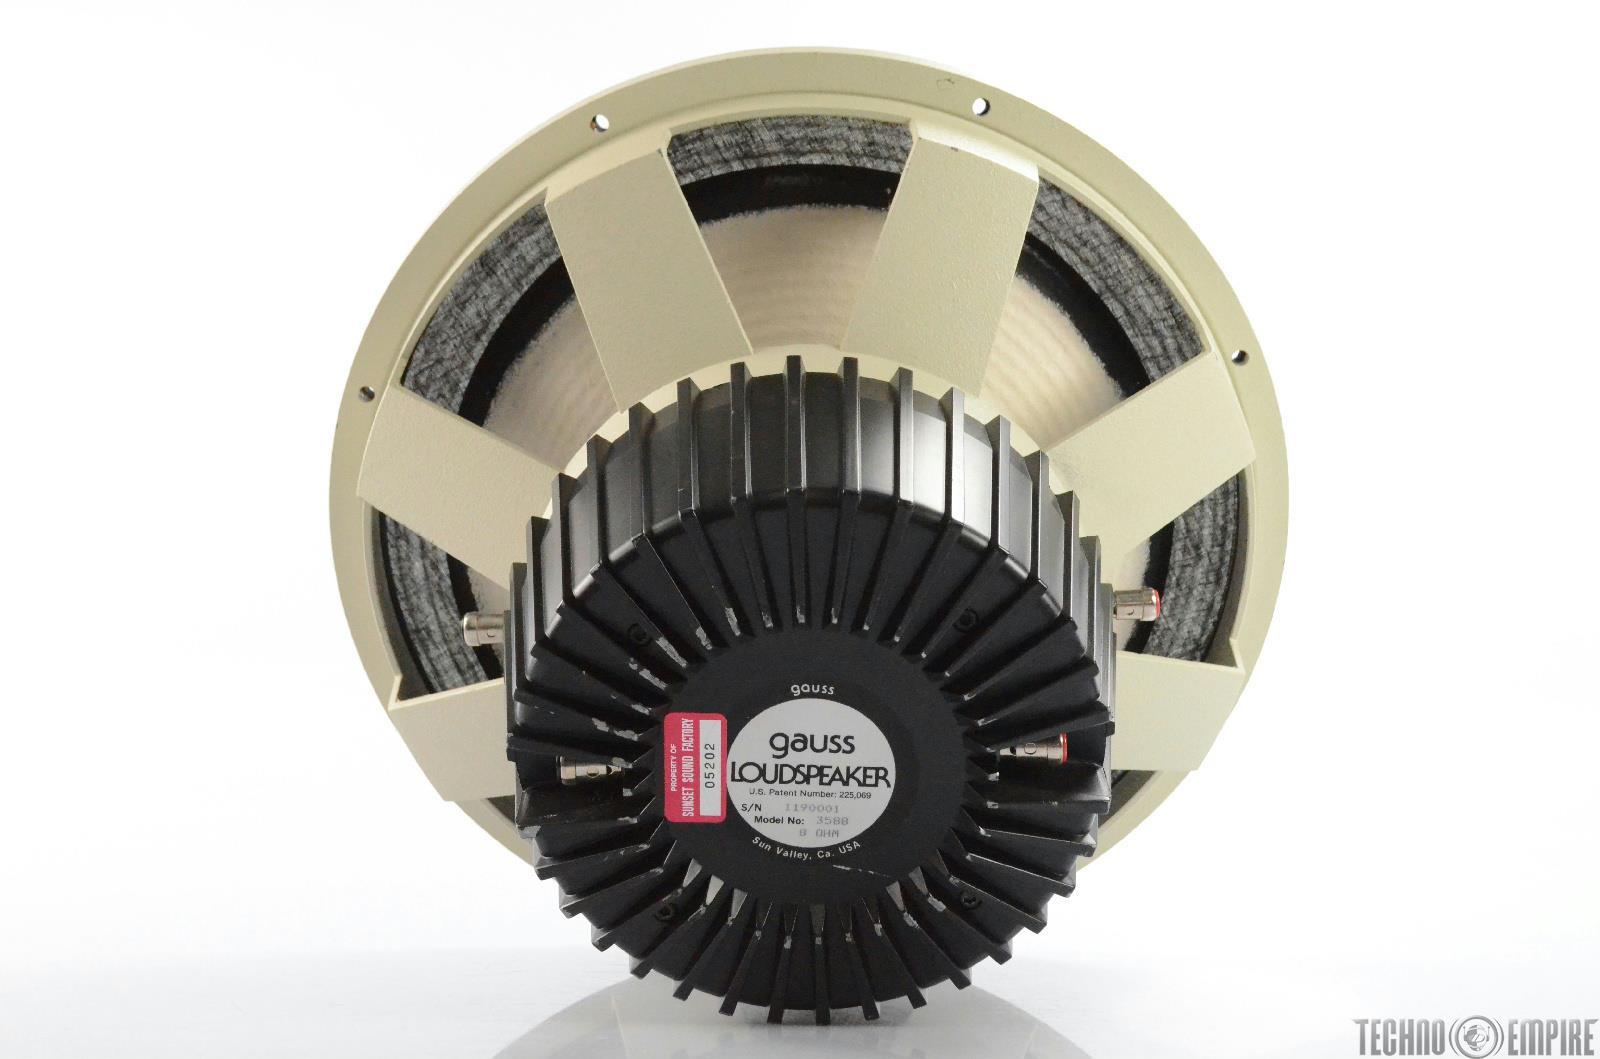 "Gauss 3588 15"" Coaxial Loudspeaker Speaker from Sunset Sound Factory #30592"